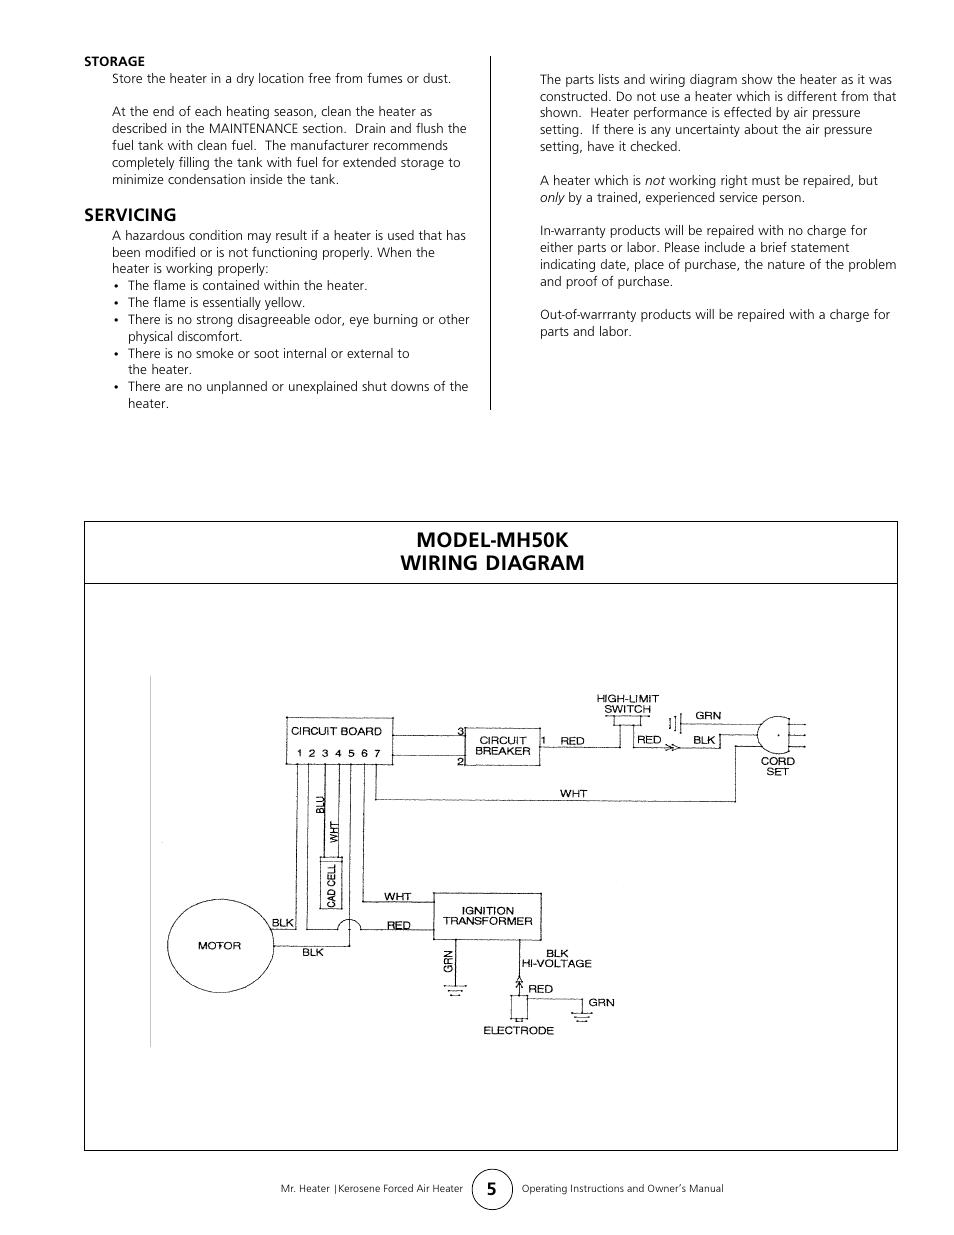 Model-mh50k wiring diagram | Mr. Heater MH50K User Manual | Page 5 / 8 |  Original modeManuals Directory